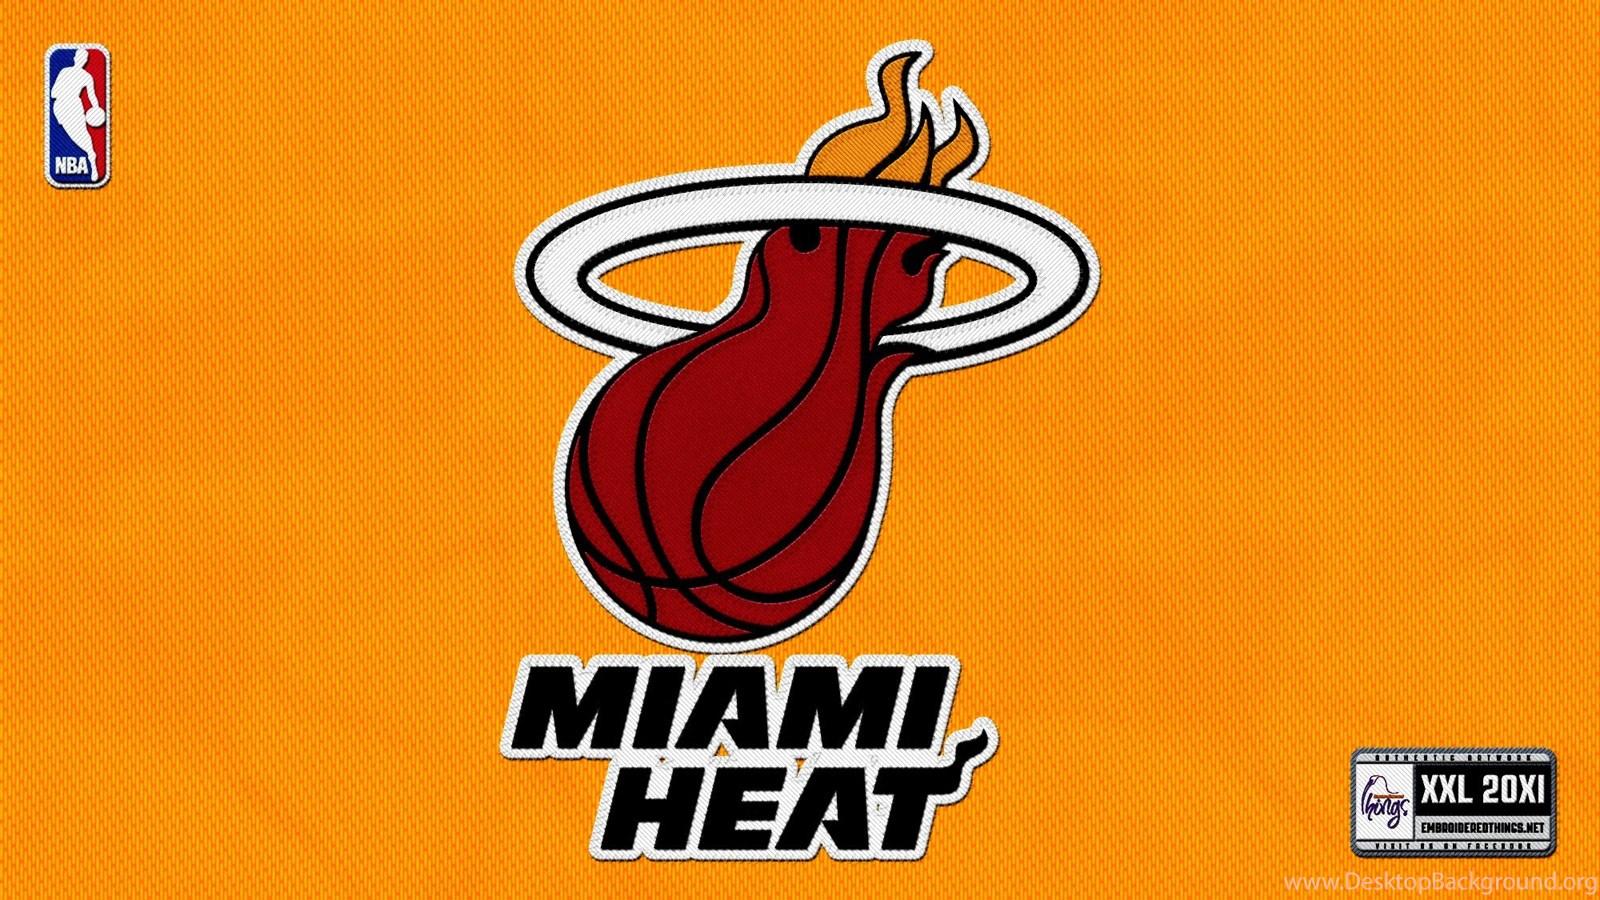 Miami heat logo hd backgrounds desktop background popular voltagebd Images